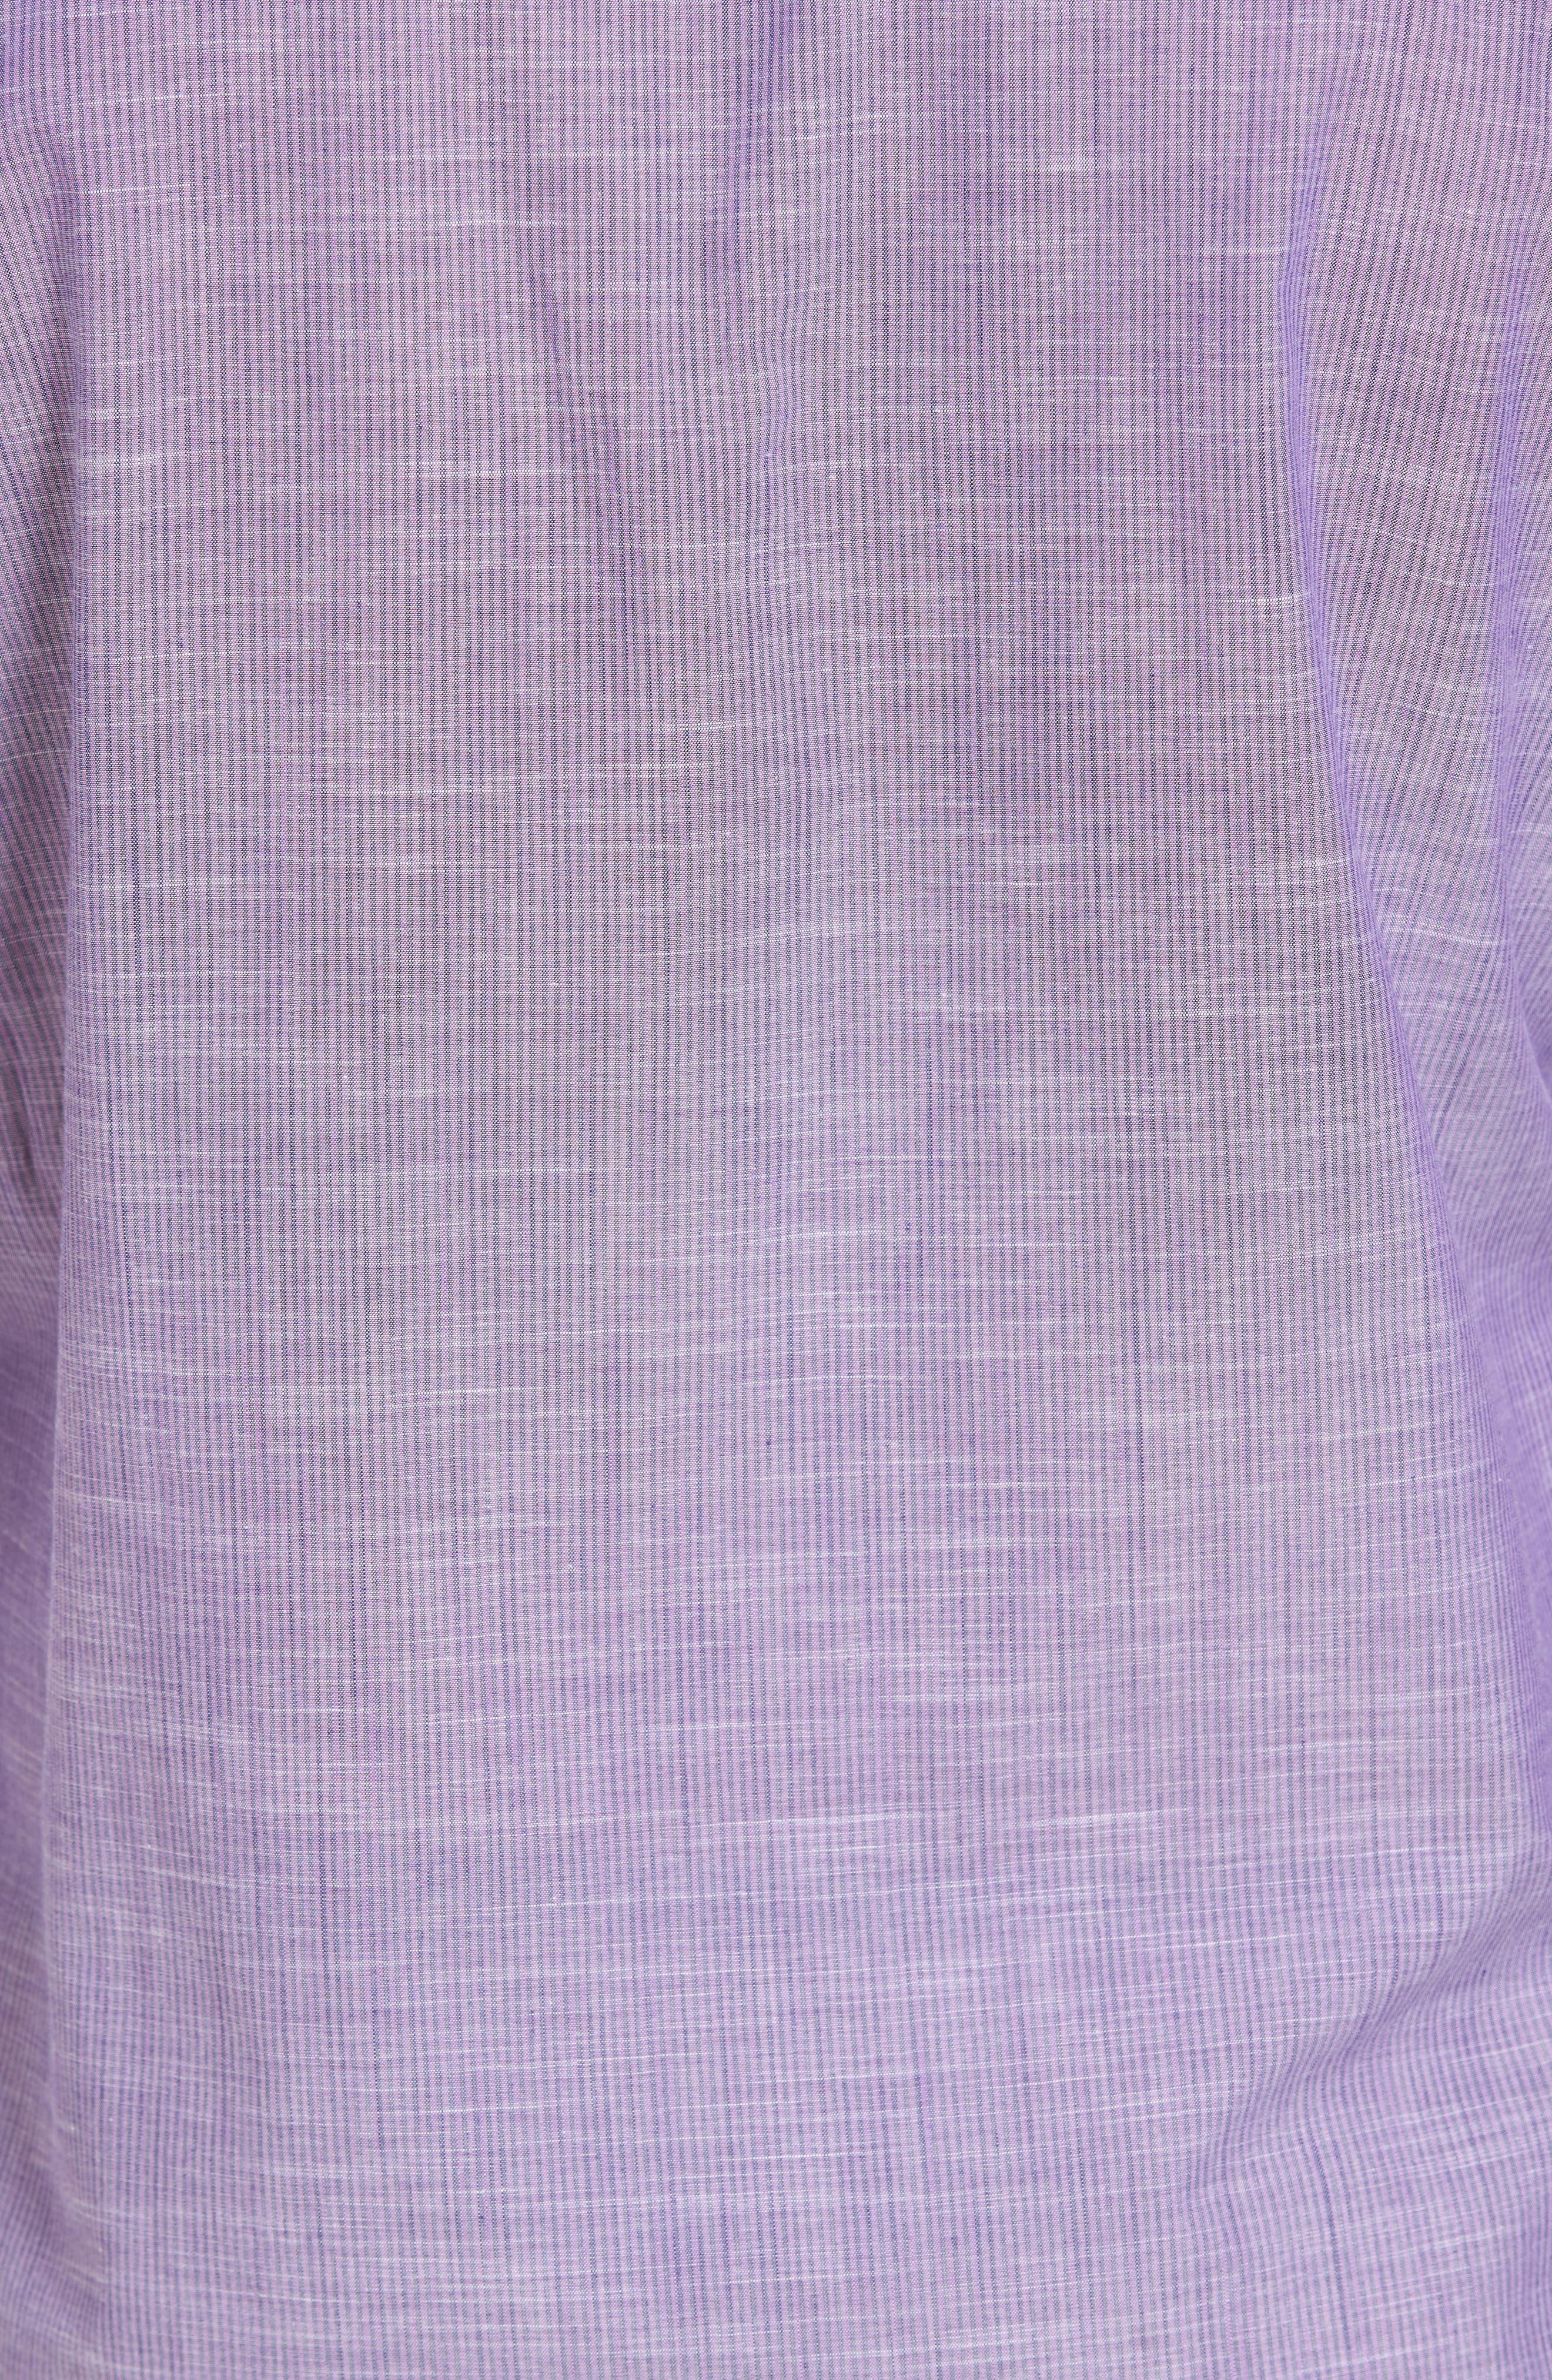 Snower Slim Fit Sport Shirt,                             Alternate thumbnail 5, color,                             500